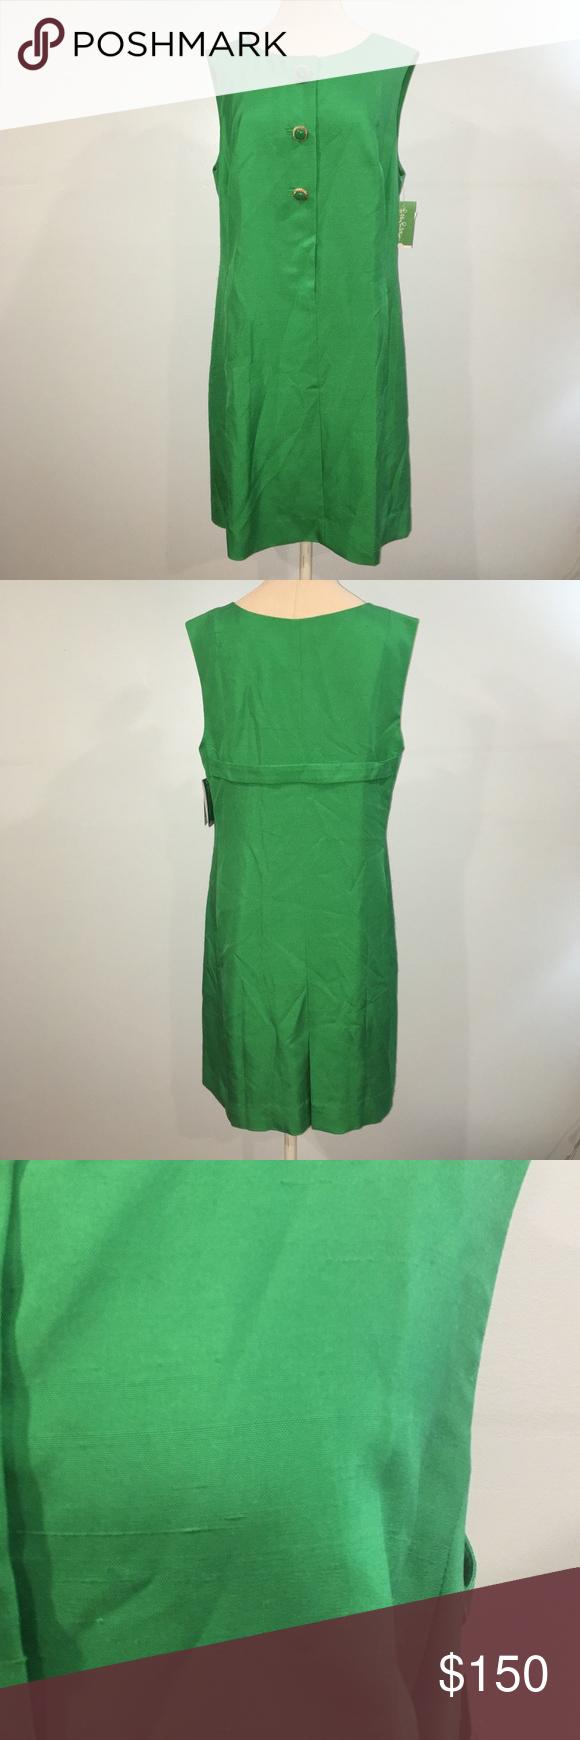 Lilly Pulitzer Green Kelan Dress Lilly Pulitzer Lifeguard Green Kelan Dress Matte Dupioni Beautiful 100 Silk Shift D Dresses Clothes Design Silk Shift Dress [ 1740 x 580 Pixel ]